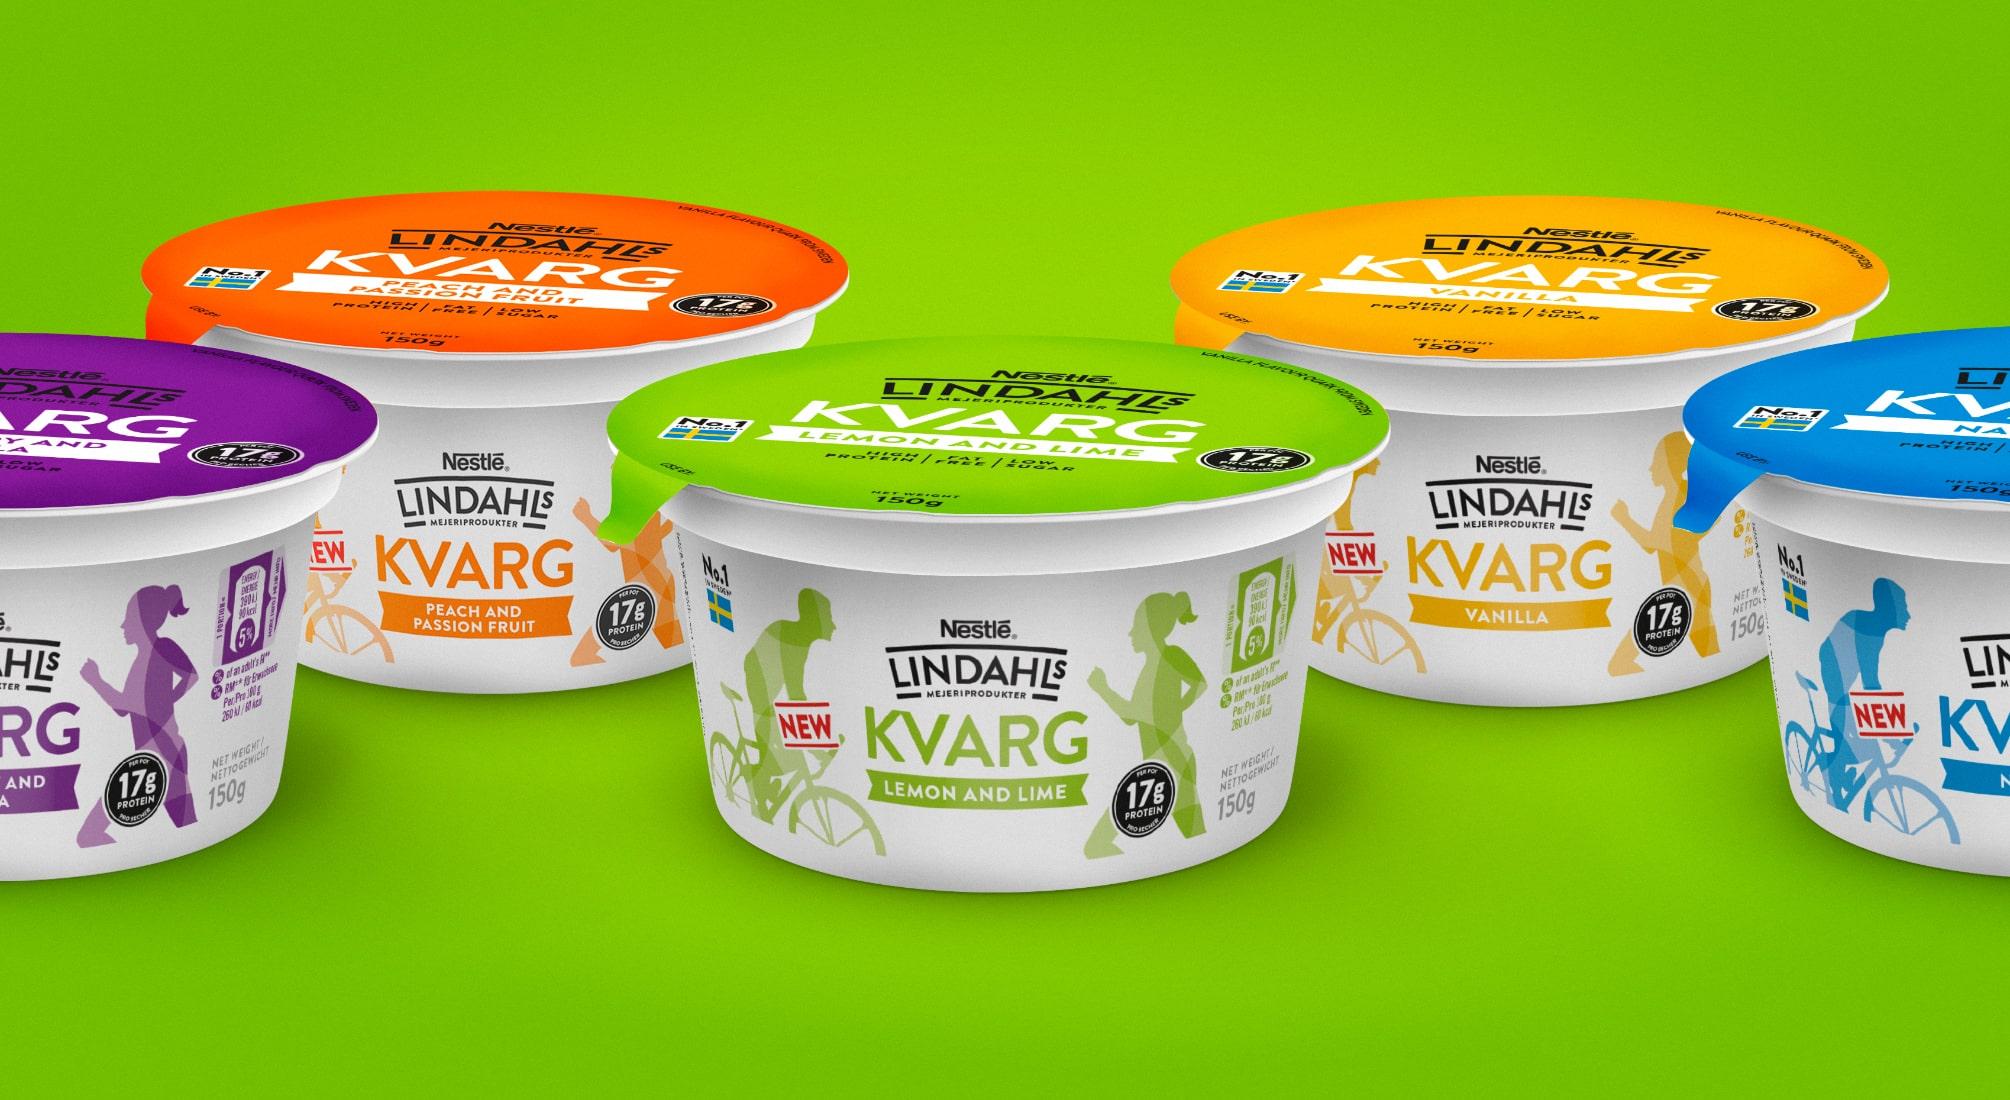 Lindahls Kvarg Yogurt Packaging   Q+H London